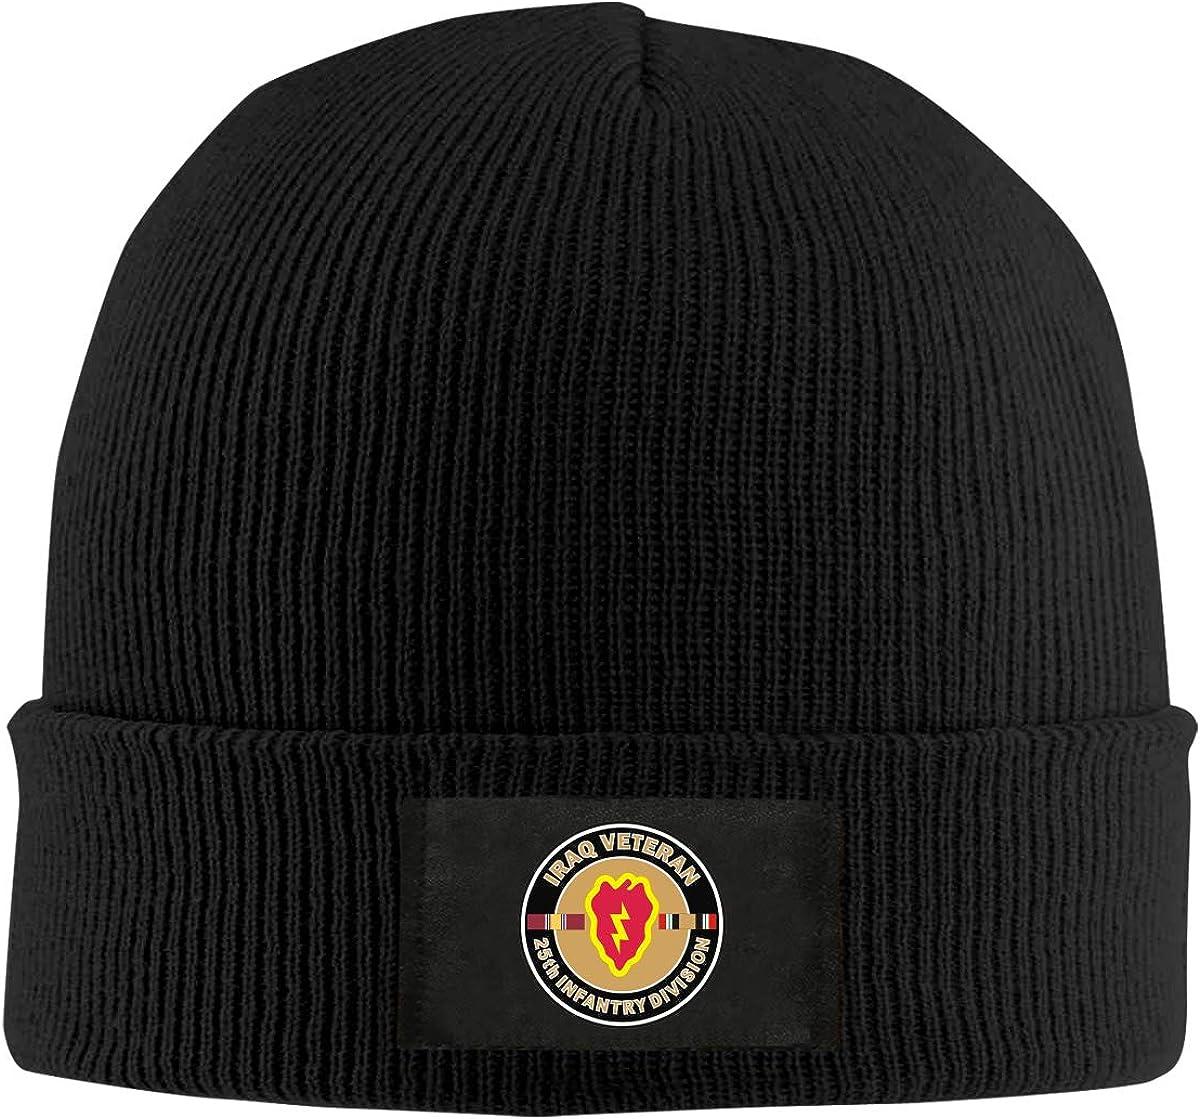 Unisex Warm Winter Hat Knit Cap Win Beanie Cuff [Alternative dealer] Skull SALENEW very popular